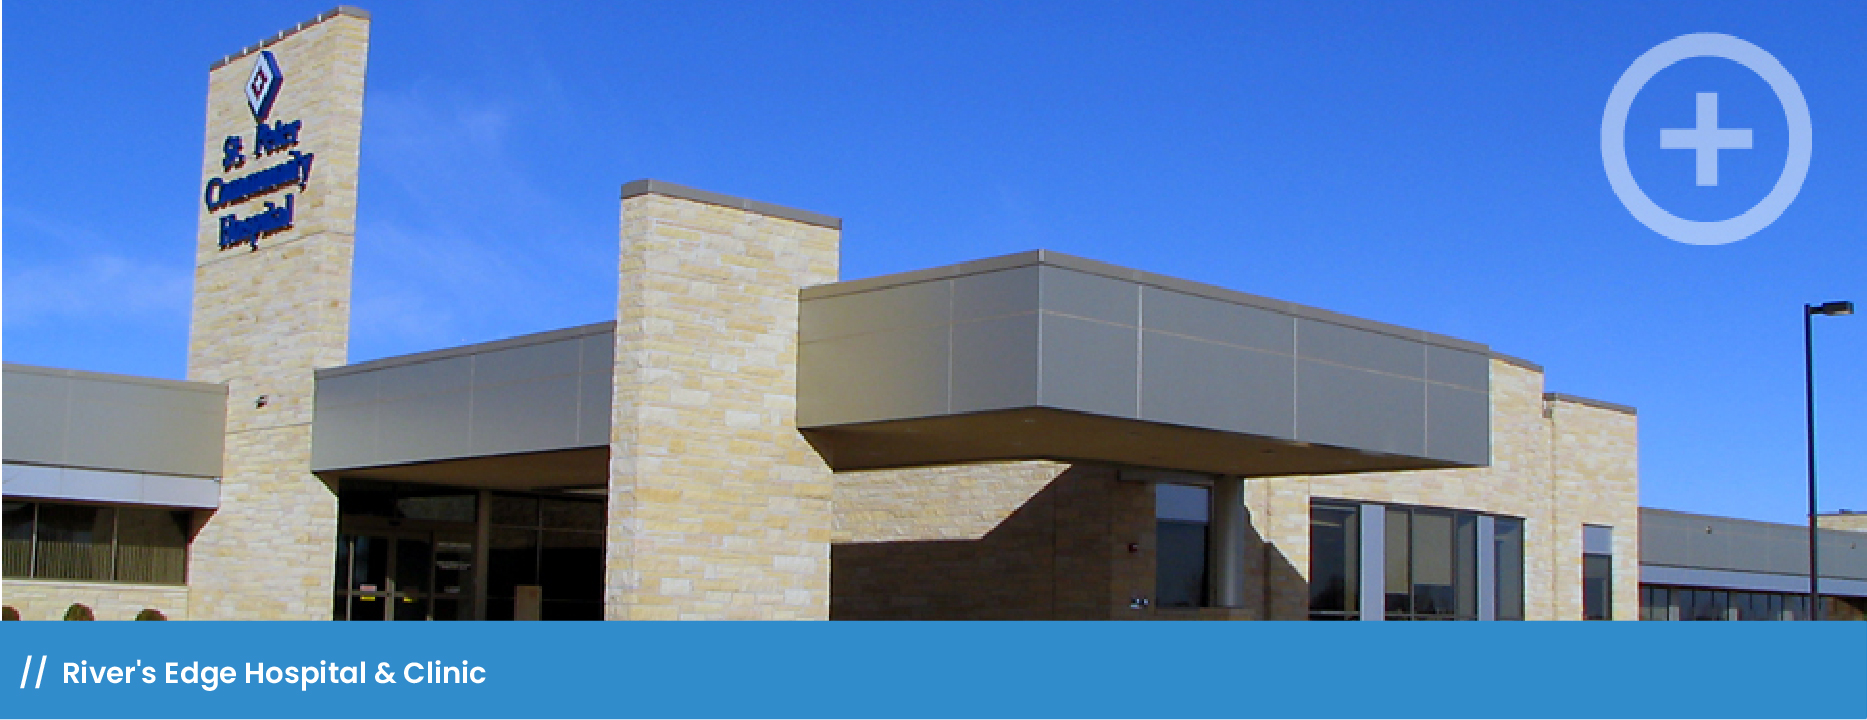 Yanik-Watermark_River's Edge Hospital & Clinic